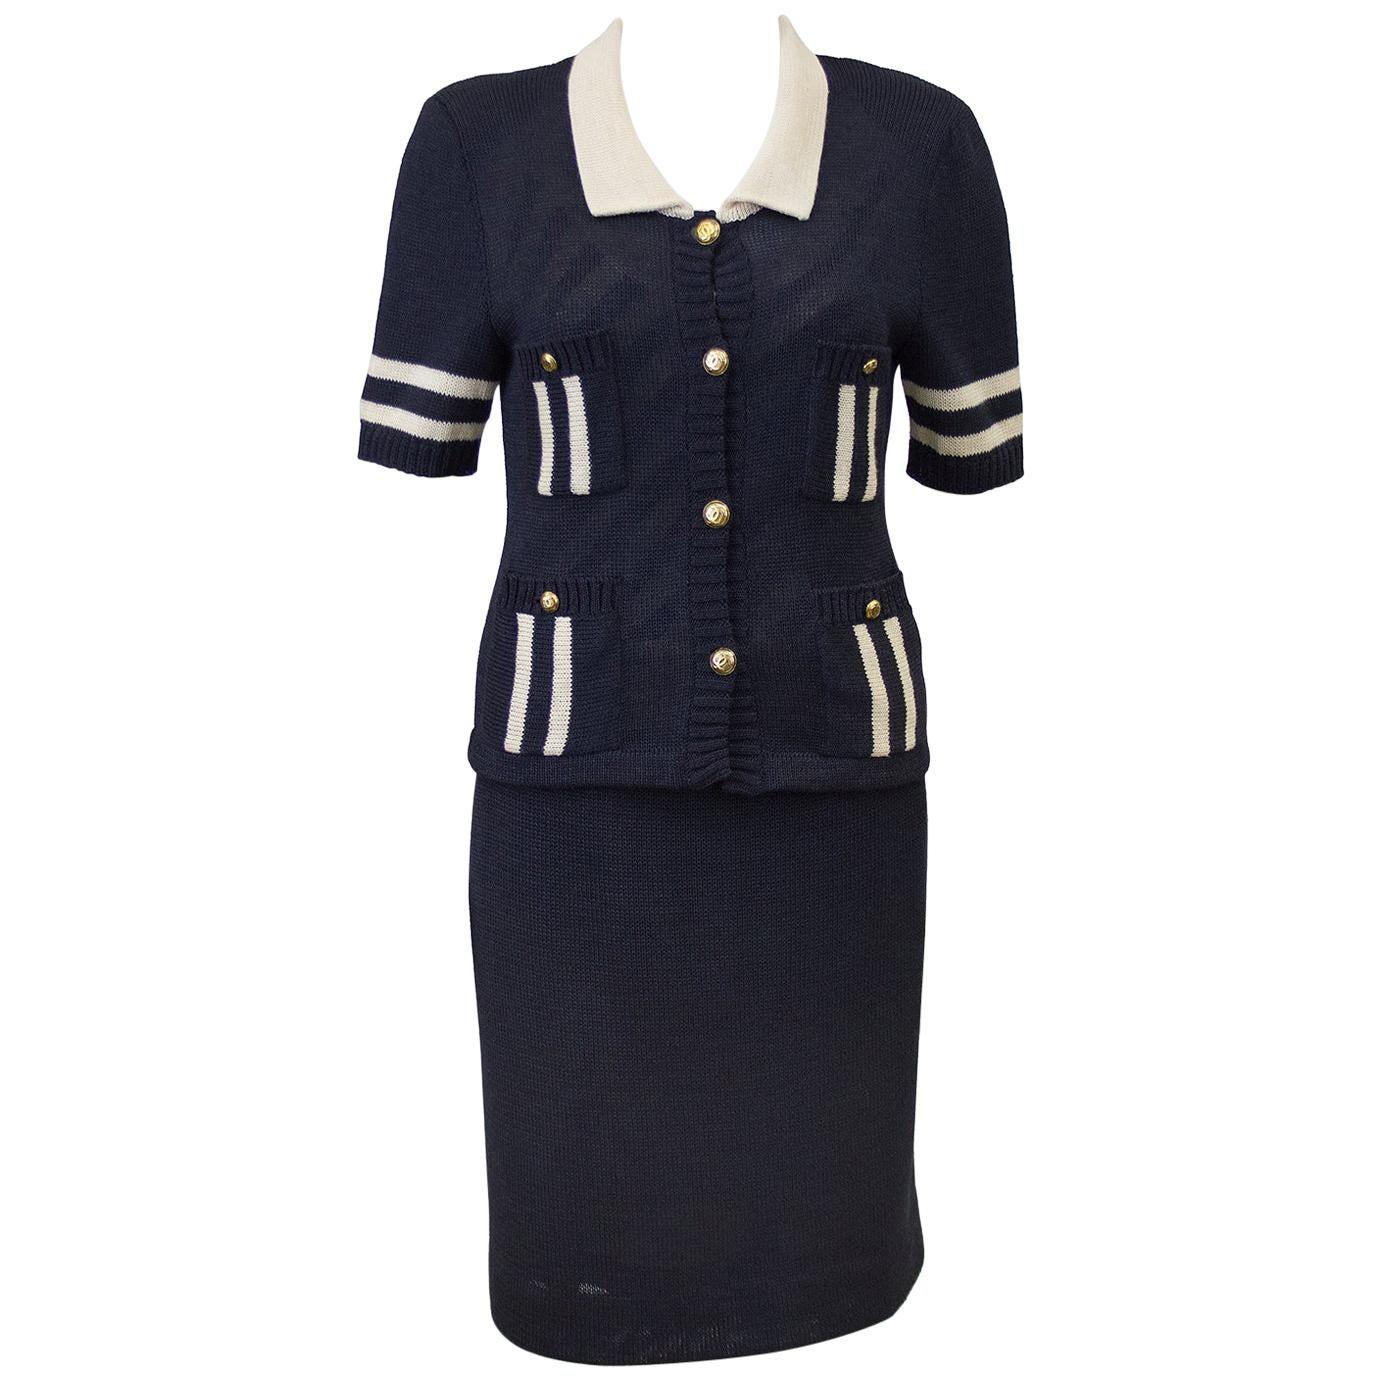 1980s Chanel Knit Navy Short Sleeve Ensemble